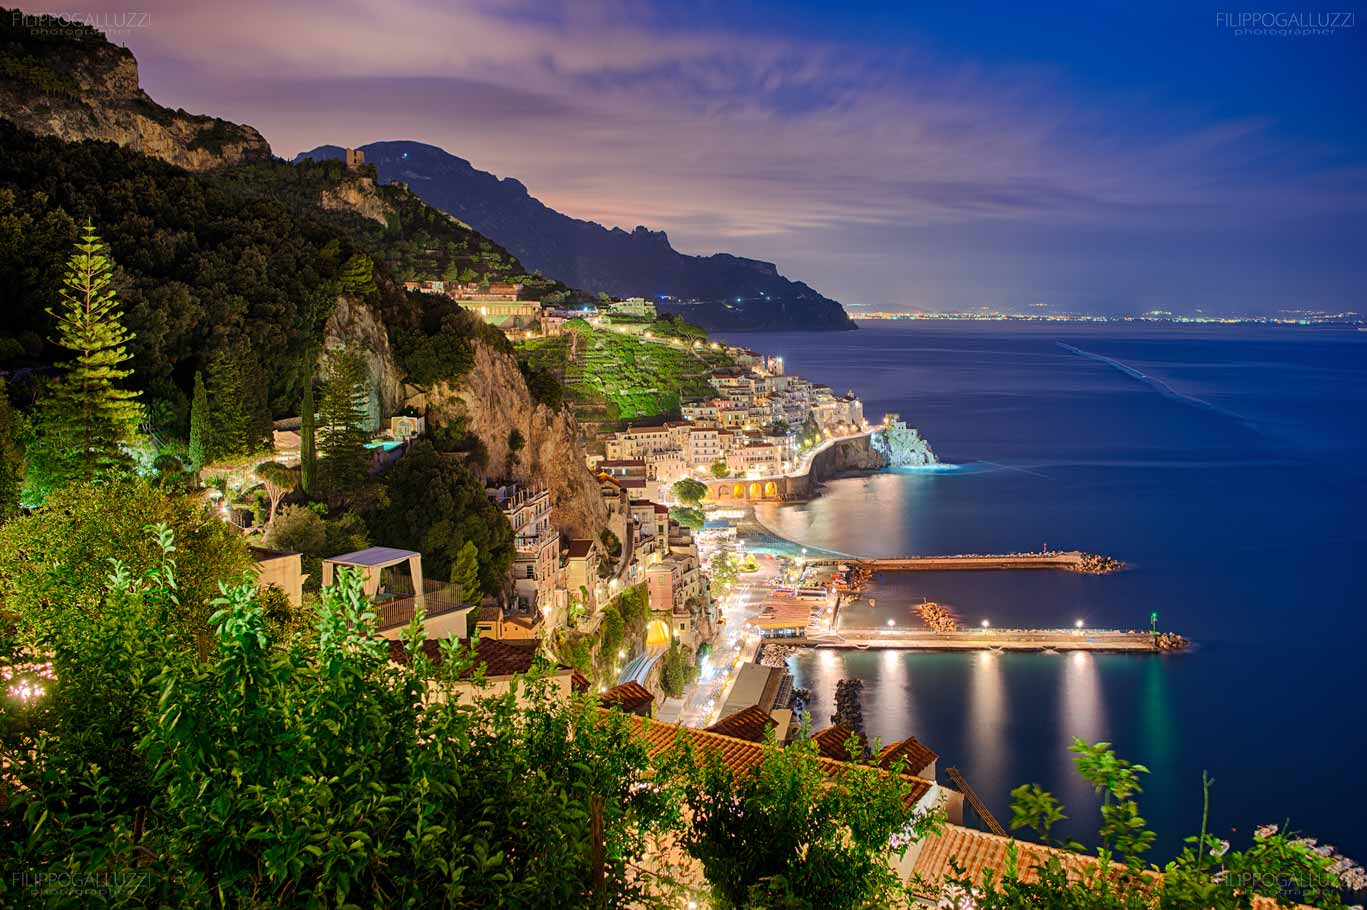 Italia_Amalfi_costiera-amalfitana